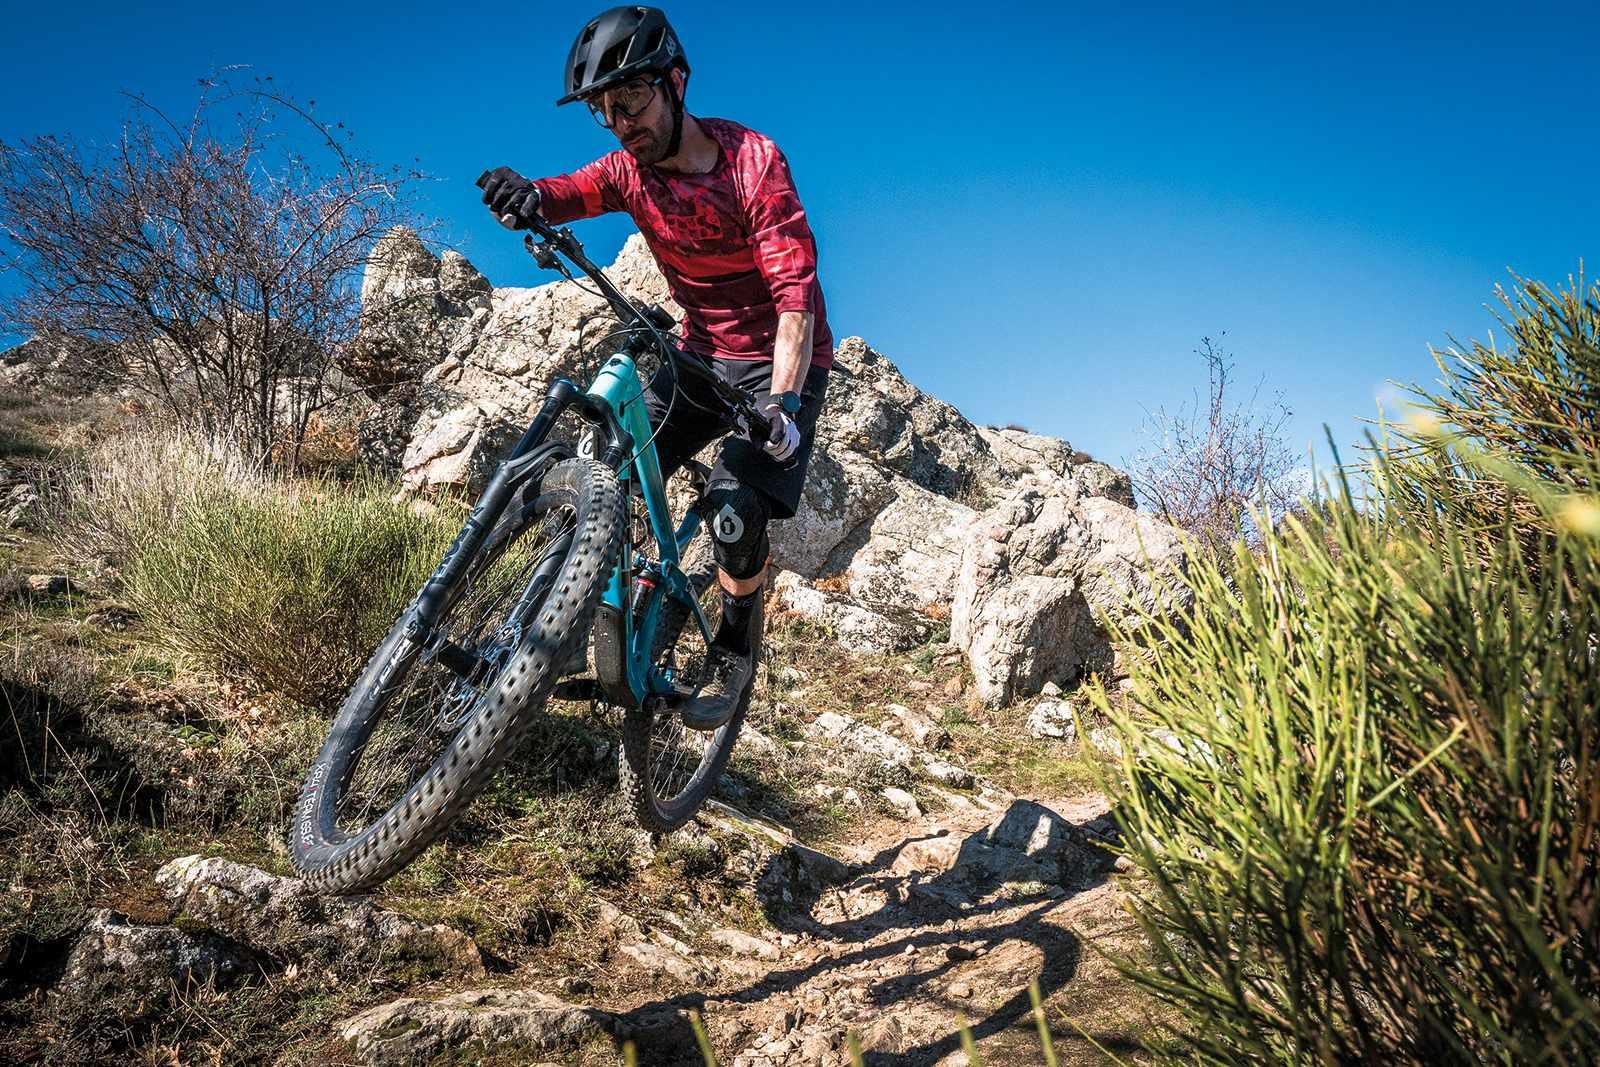 Male cyclist riding the Trek Fuel EX 9.7